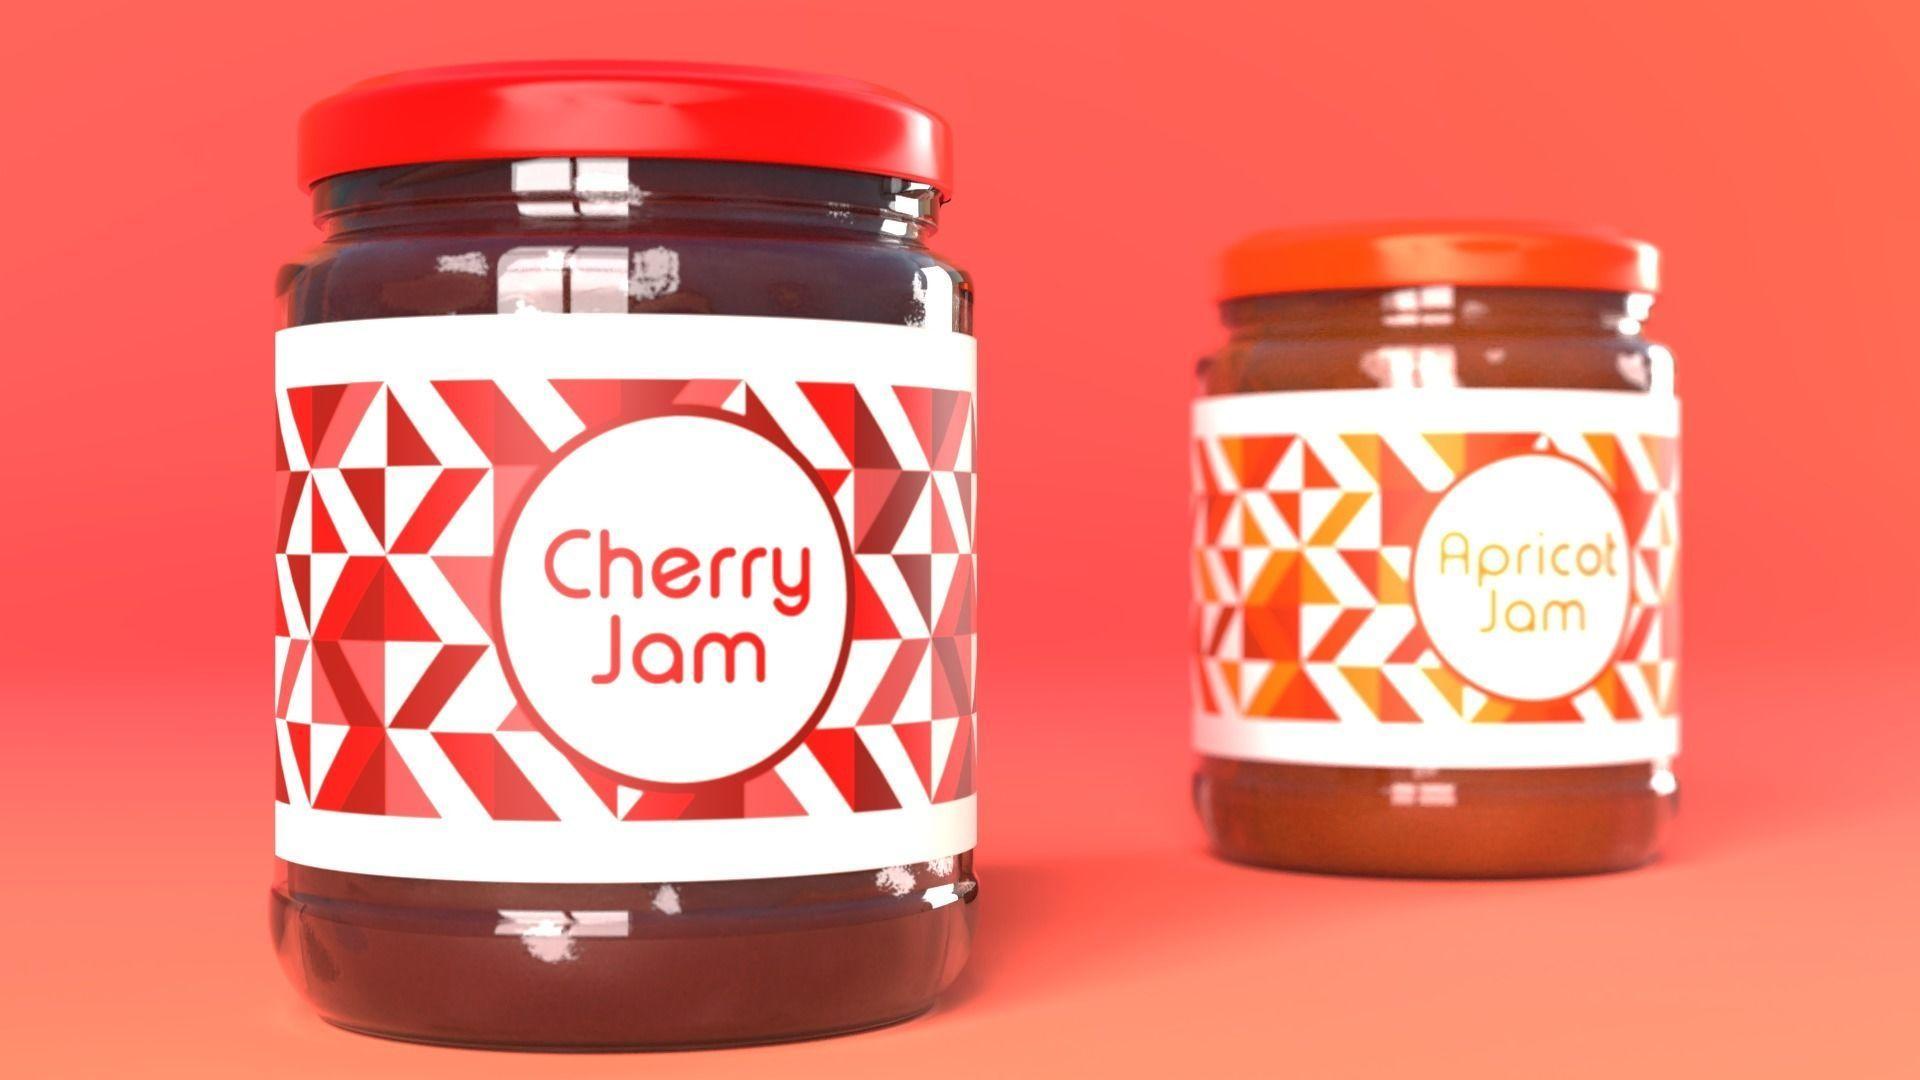 Jam Jar Apricot and Cherries